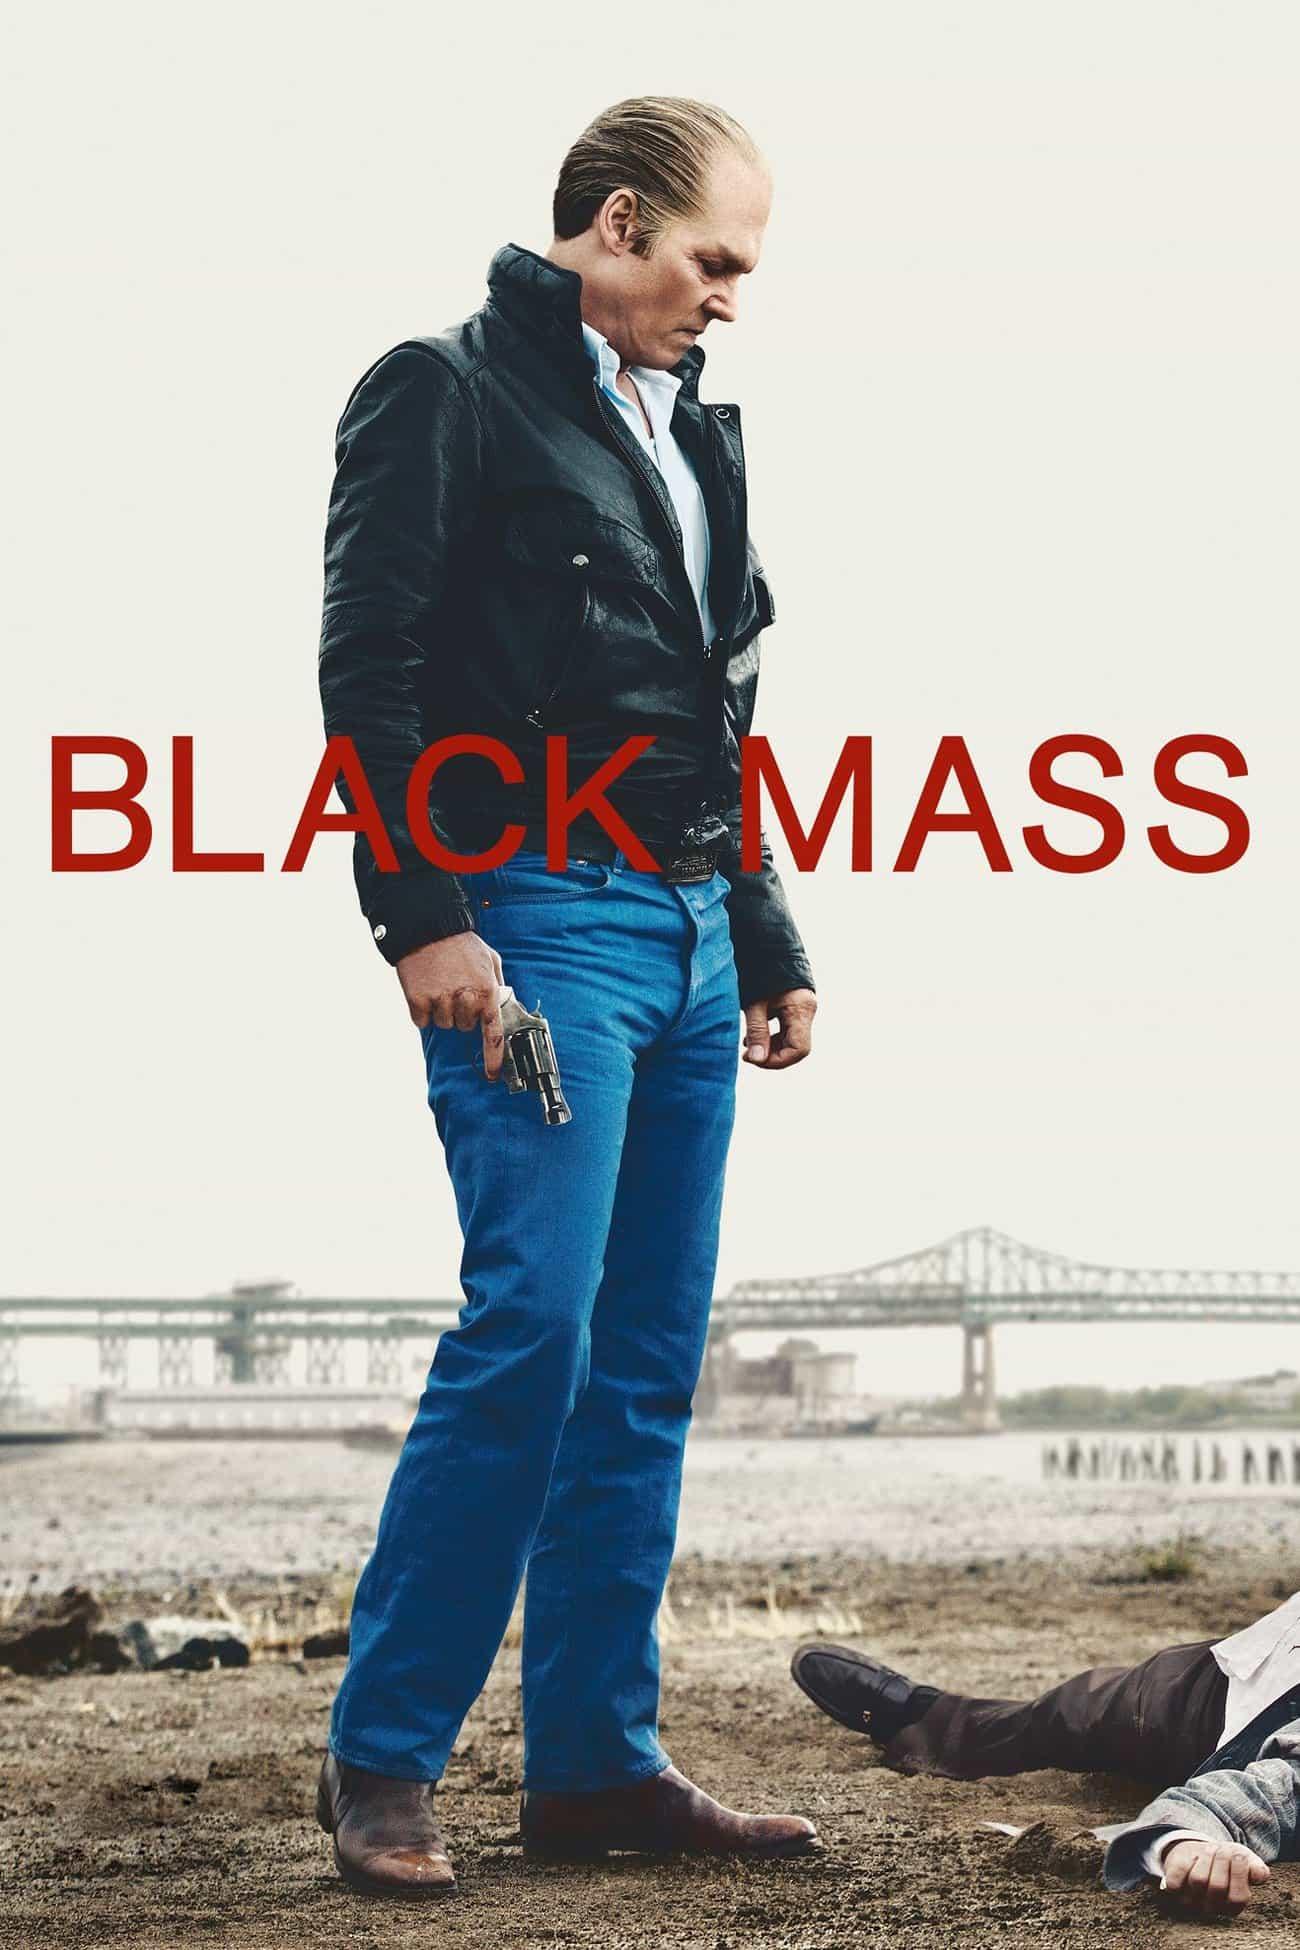 Black Mass, 2015